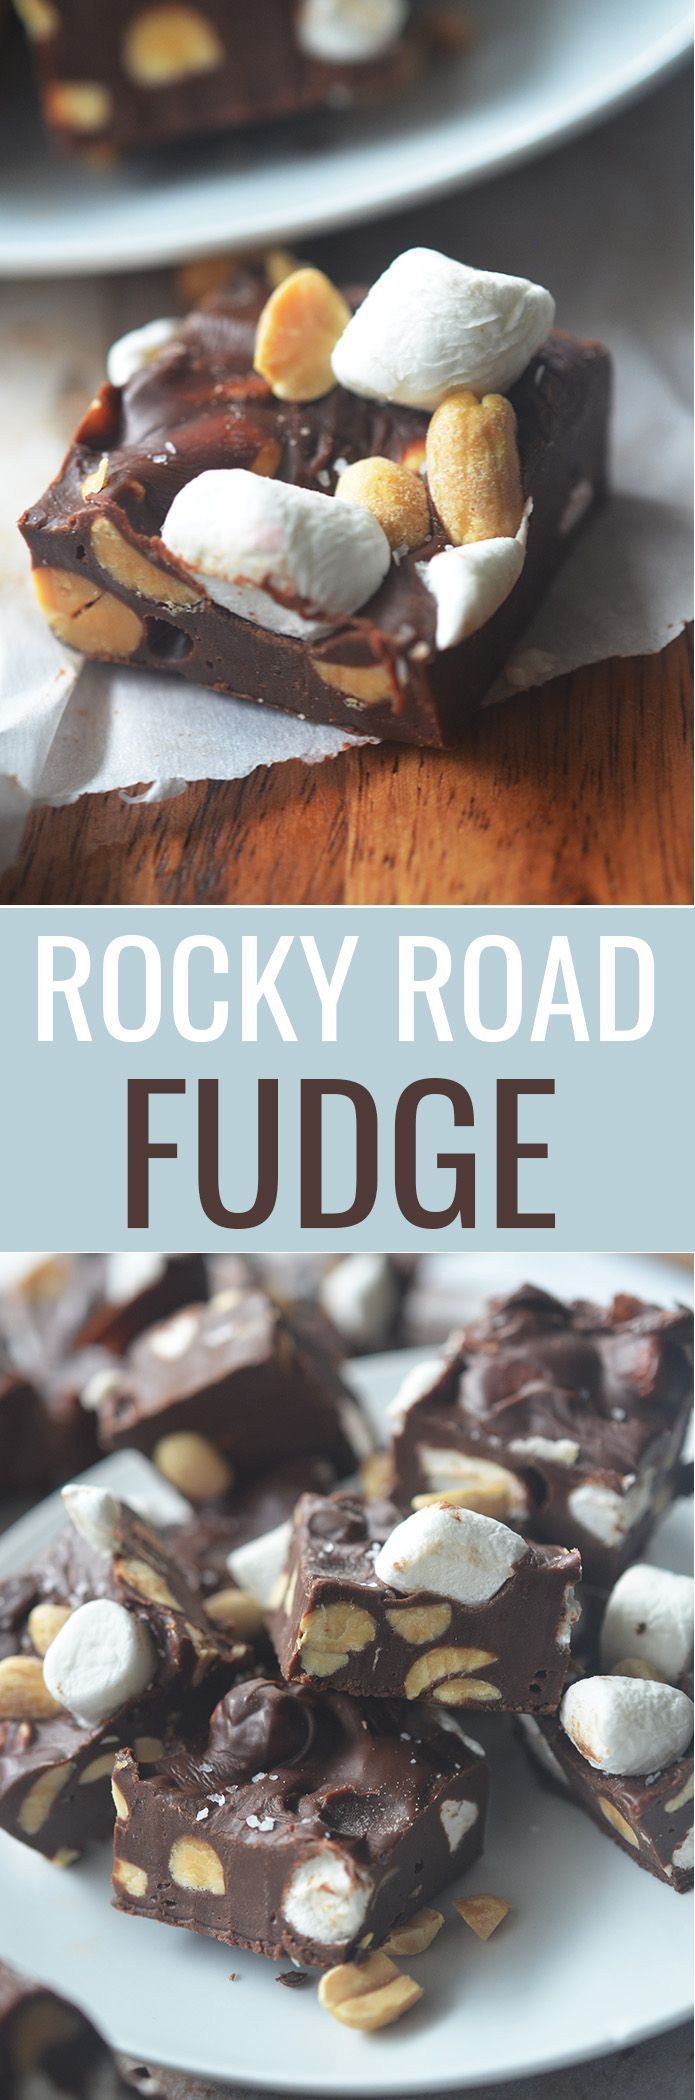 Rocky Road Fudge #rockyroadfudge Rocky Road Fudge - Recipe Diaries #fudge #Christmascandy #christmasrecipes #rockyroadfudge